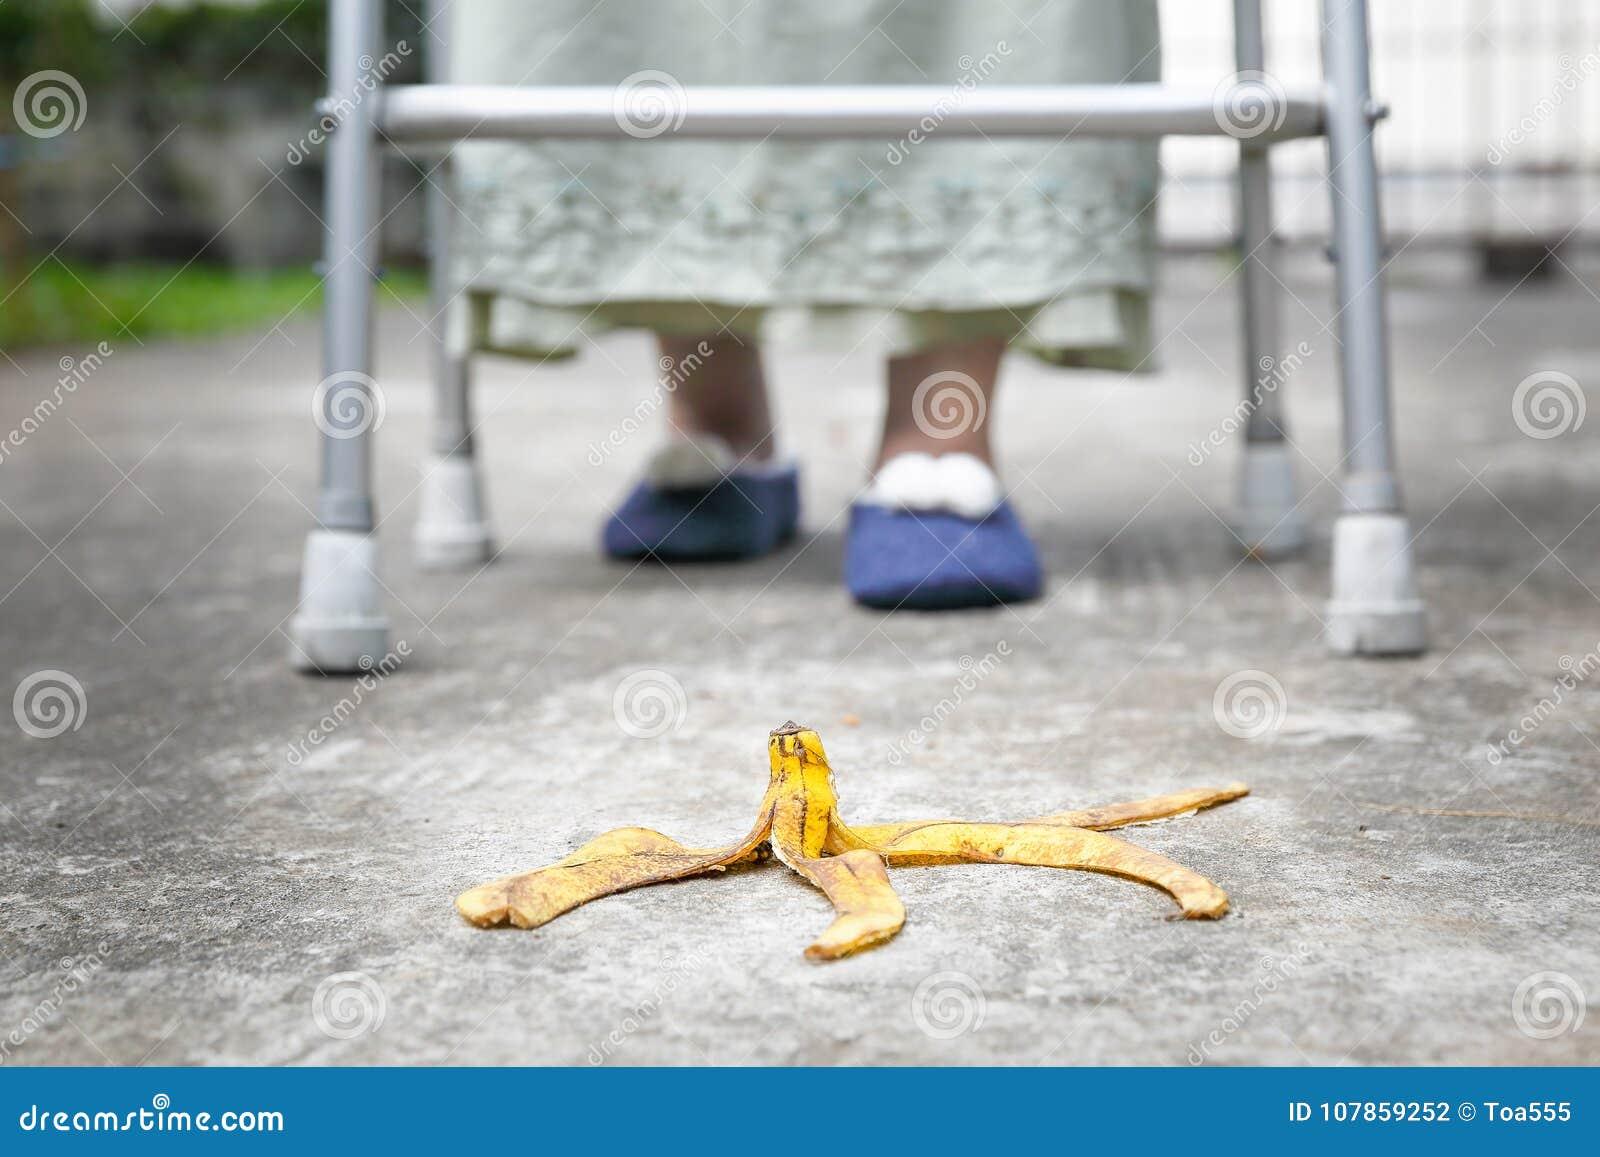 Etapa idosa descuidada da mulher sobre uma casca da banana